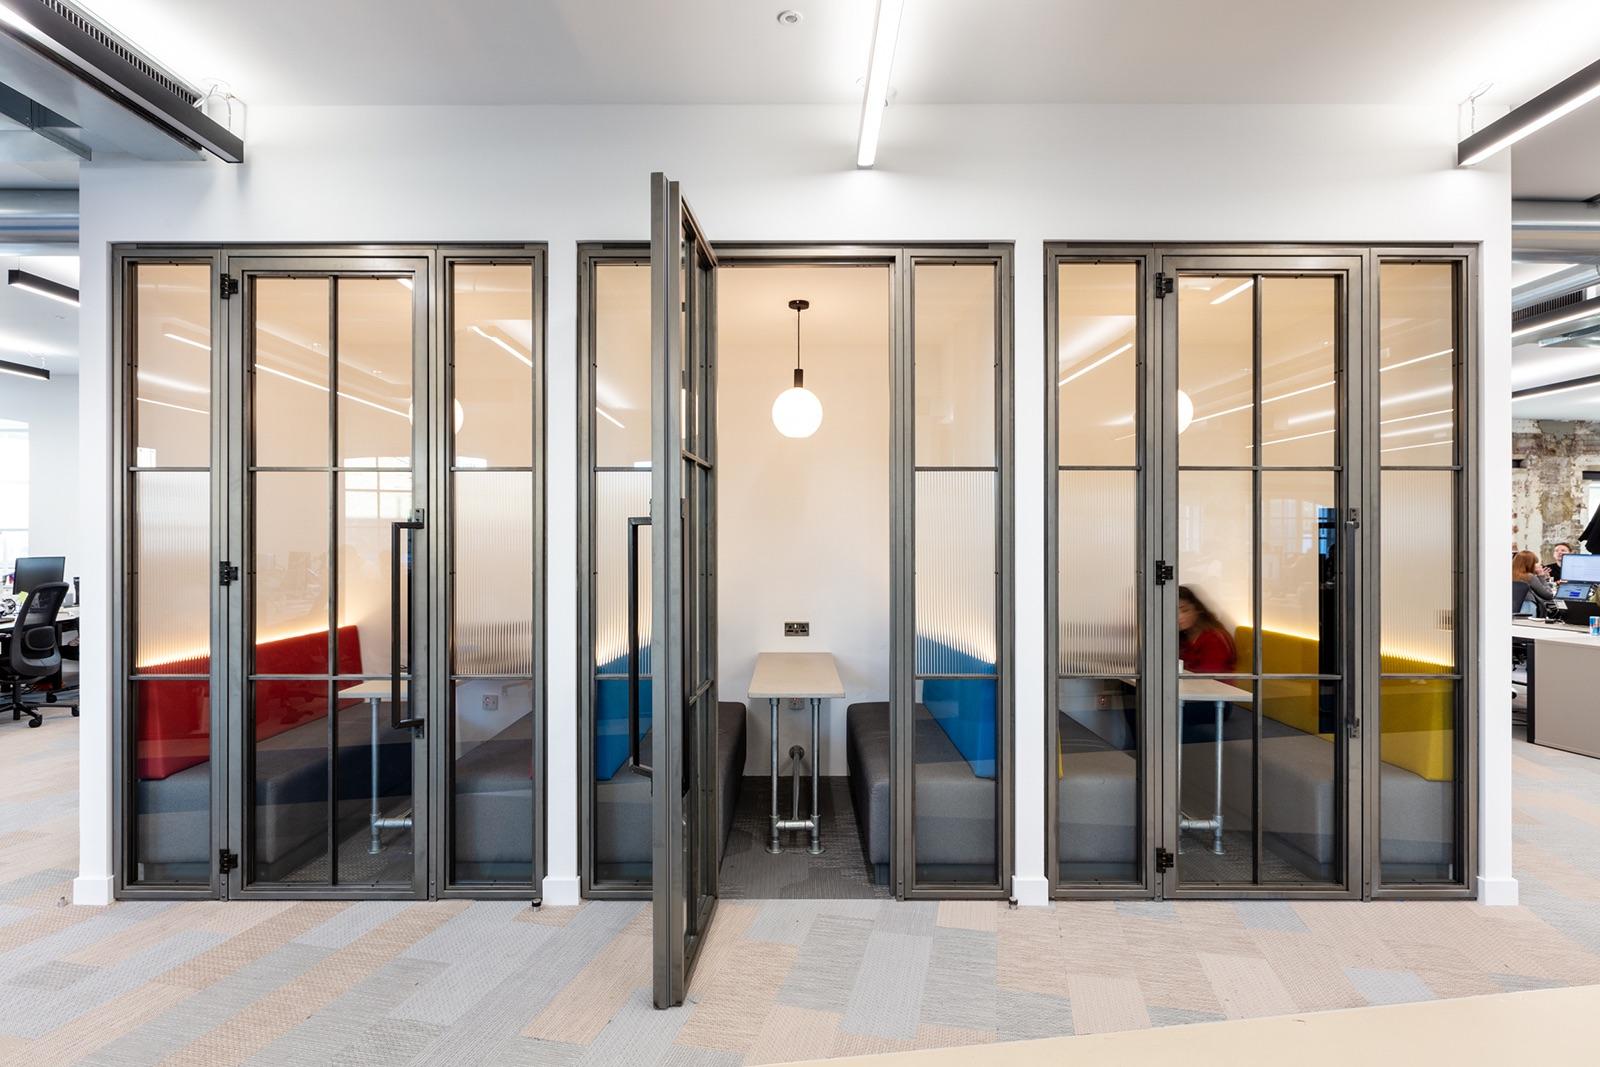 redbull-london-office-9